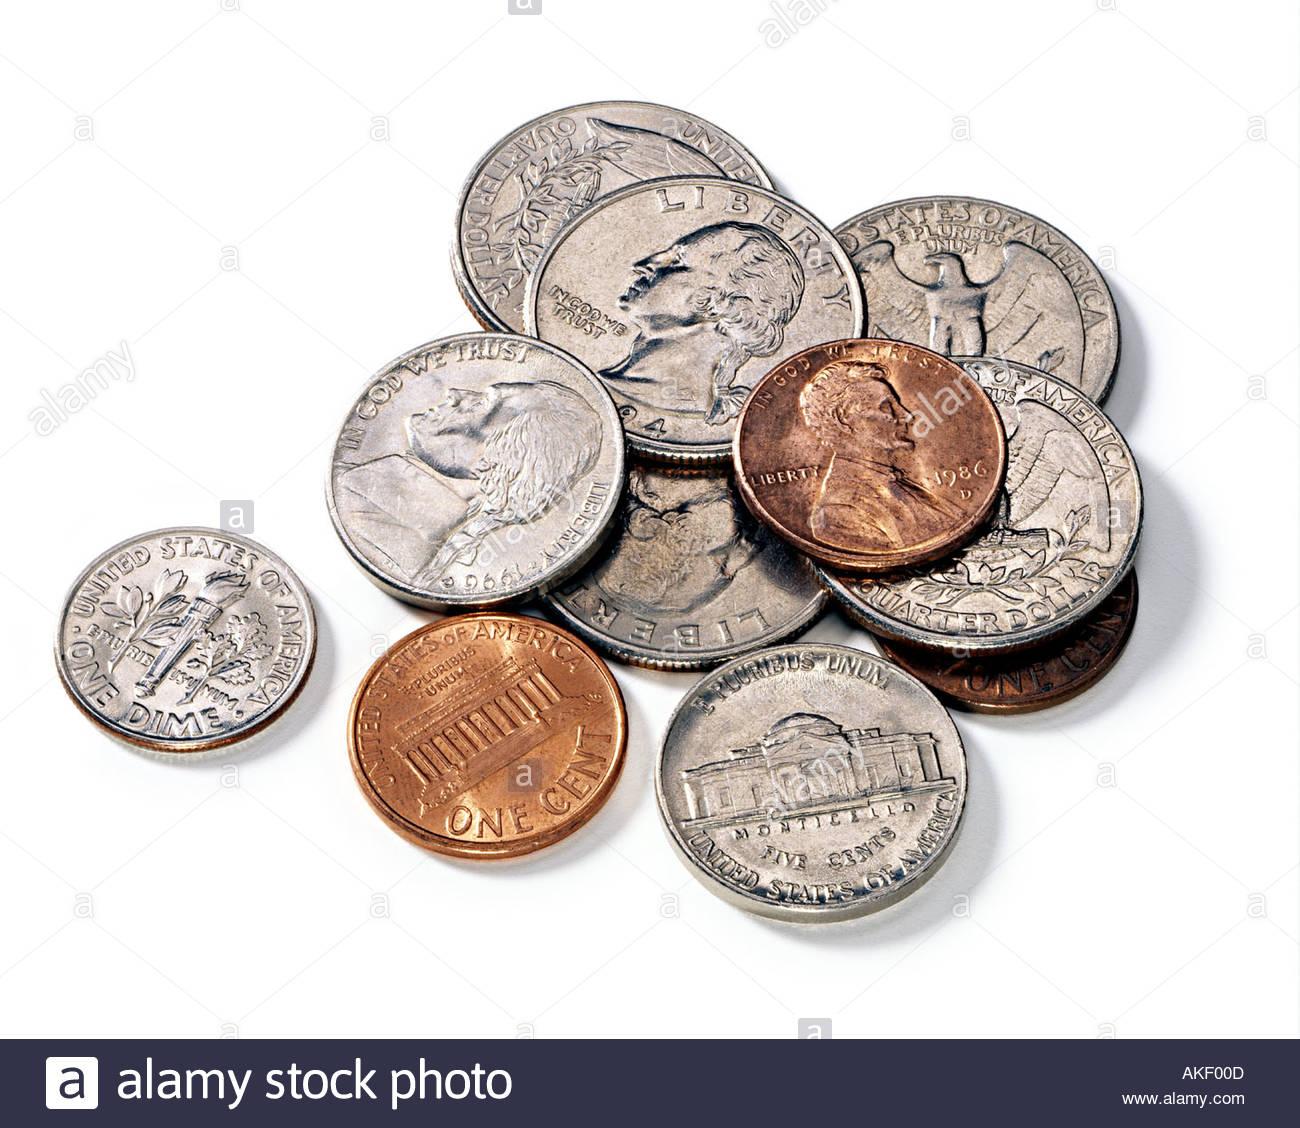 worksheet. Money Coins. Duliziyou Worksheets for Elementary School ...